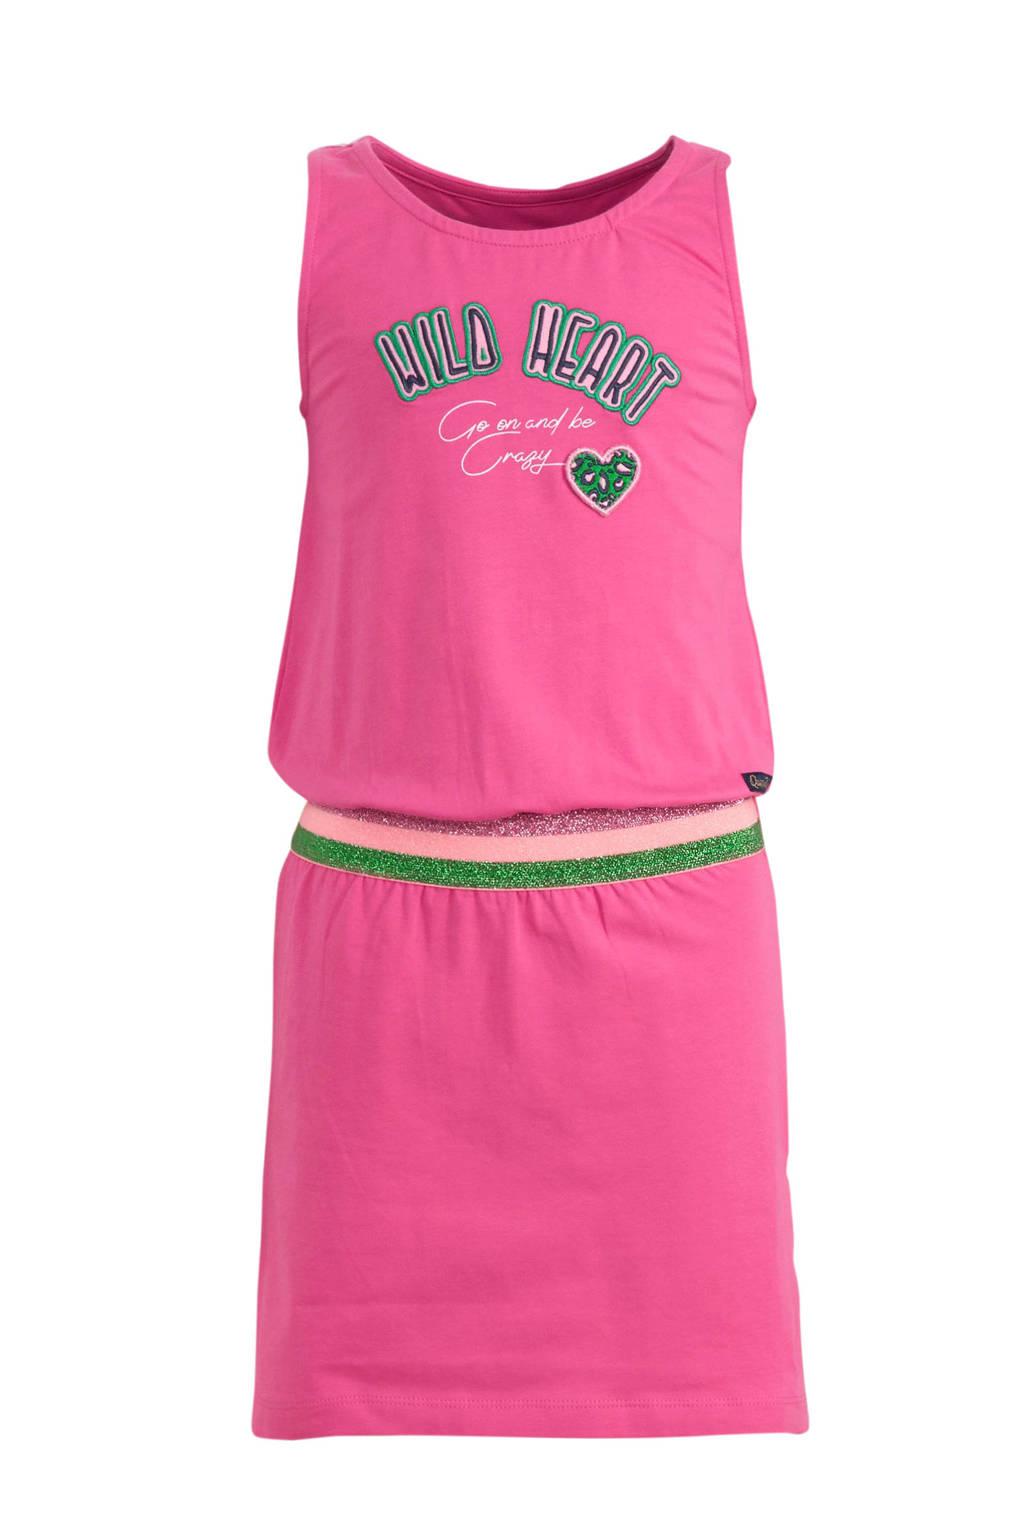 Quapi jersey jurk Aliza met printopdruk en glitters roze/groen/lichtroze, Roze/groen/lichtroze